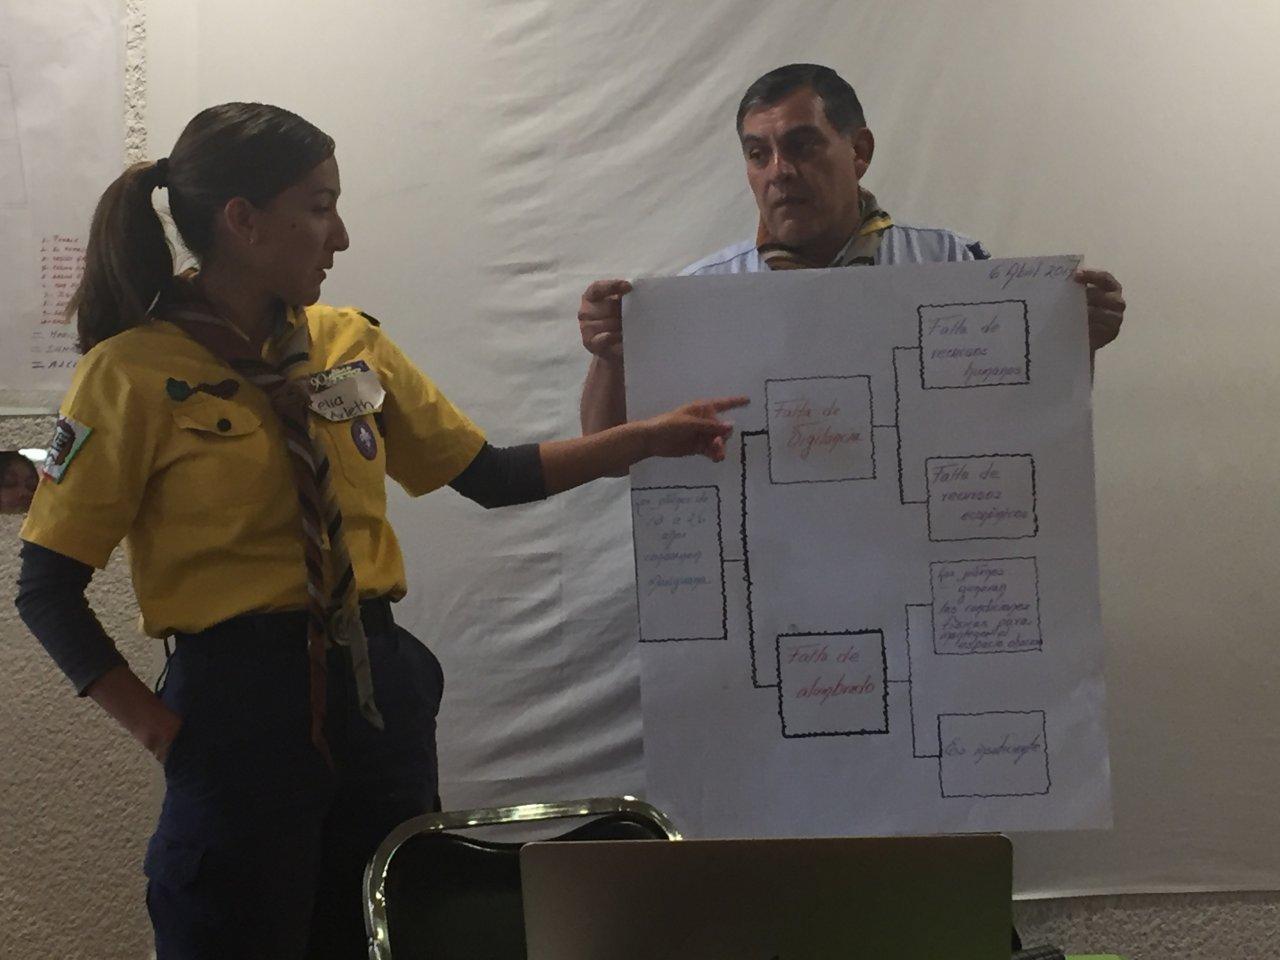 Participantes en la capacitación de CADCA en Fresnillo, México presentan su marco lógico.